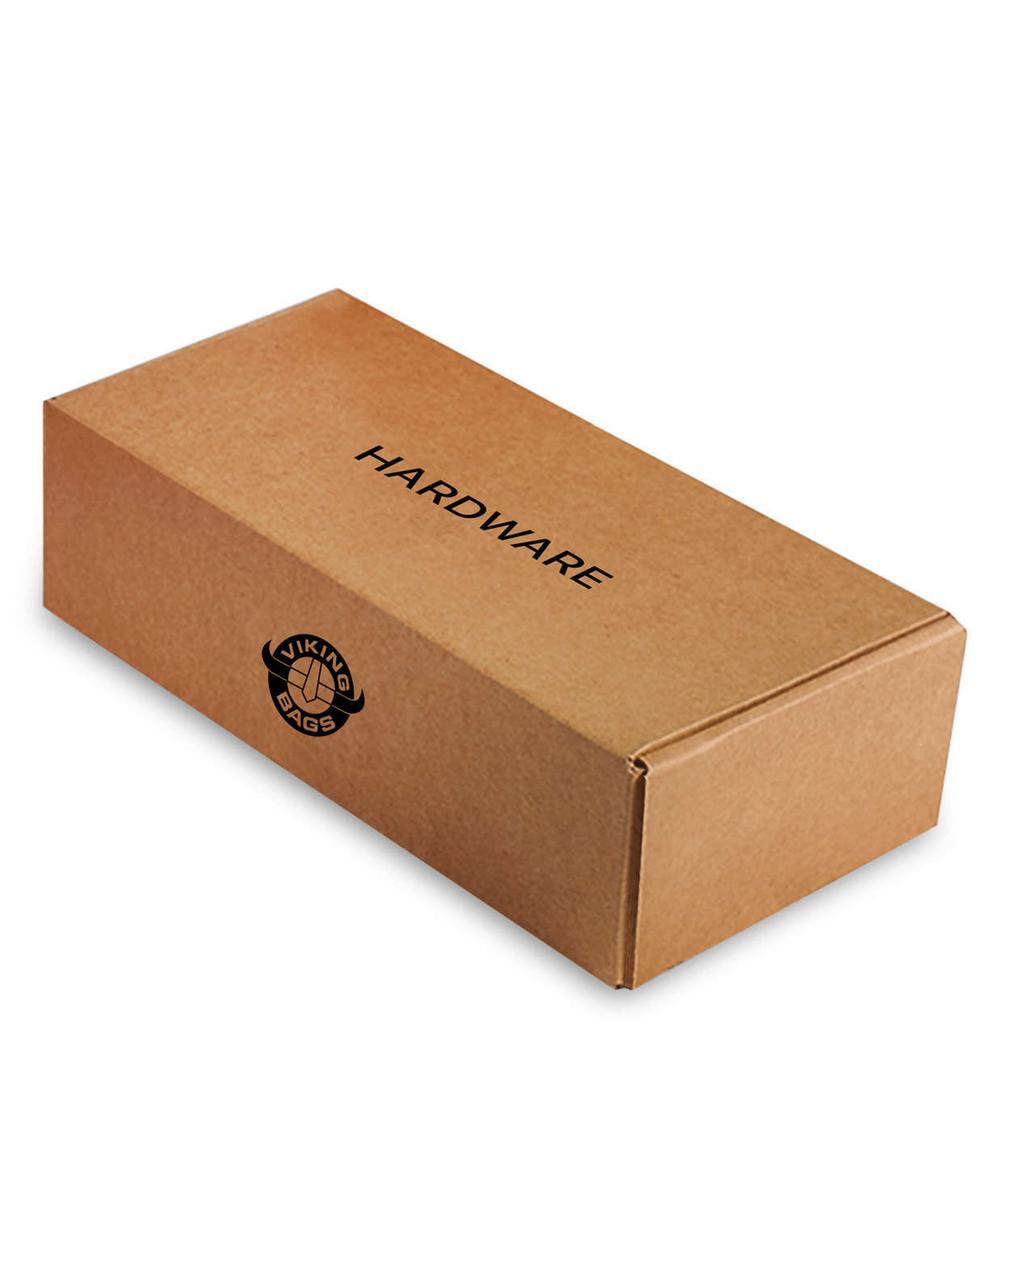 Honda VTX 1300 R Retro Viking Warrior Series Medium Motorcycle Saddlebags Hardware Box